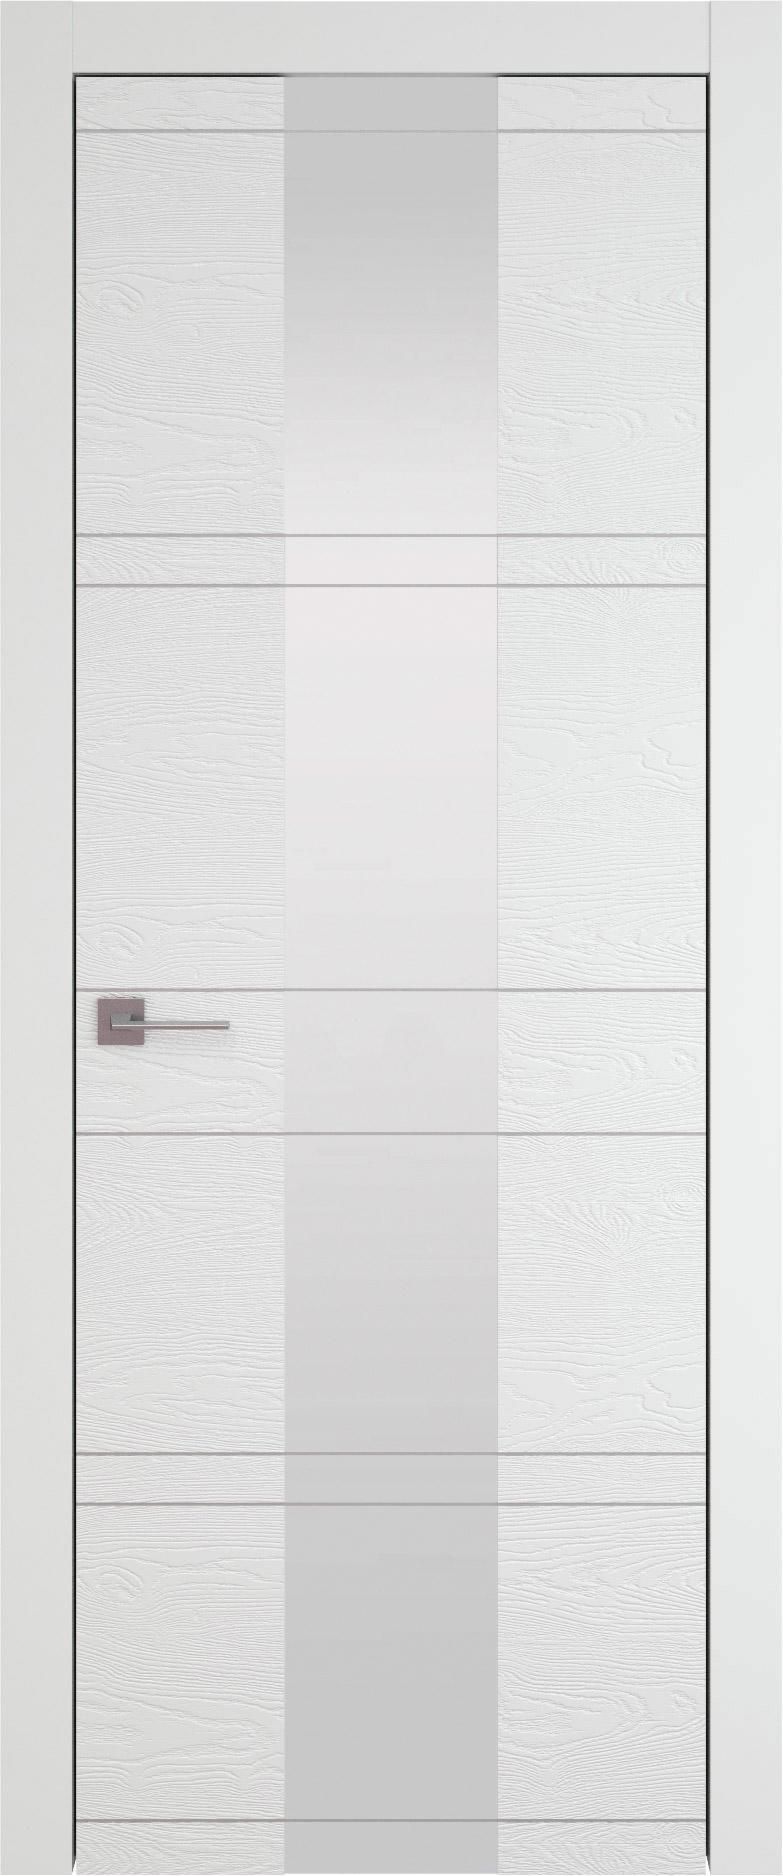 Tivoli Ж-2 цвет - Белая эмаль по шпону (RAL 9003) Со стеклом (ДО)